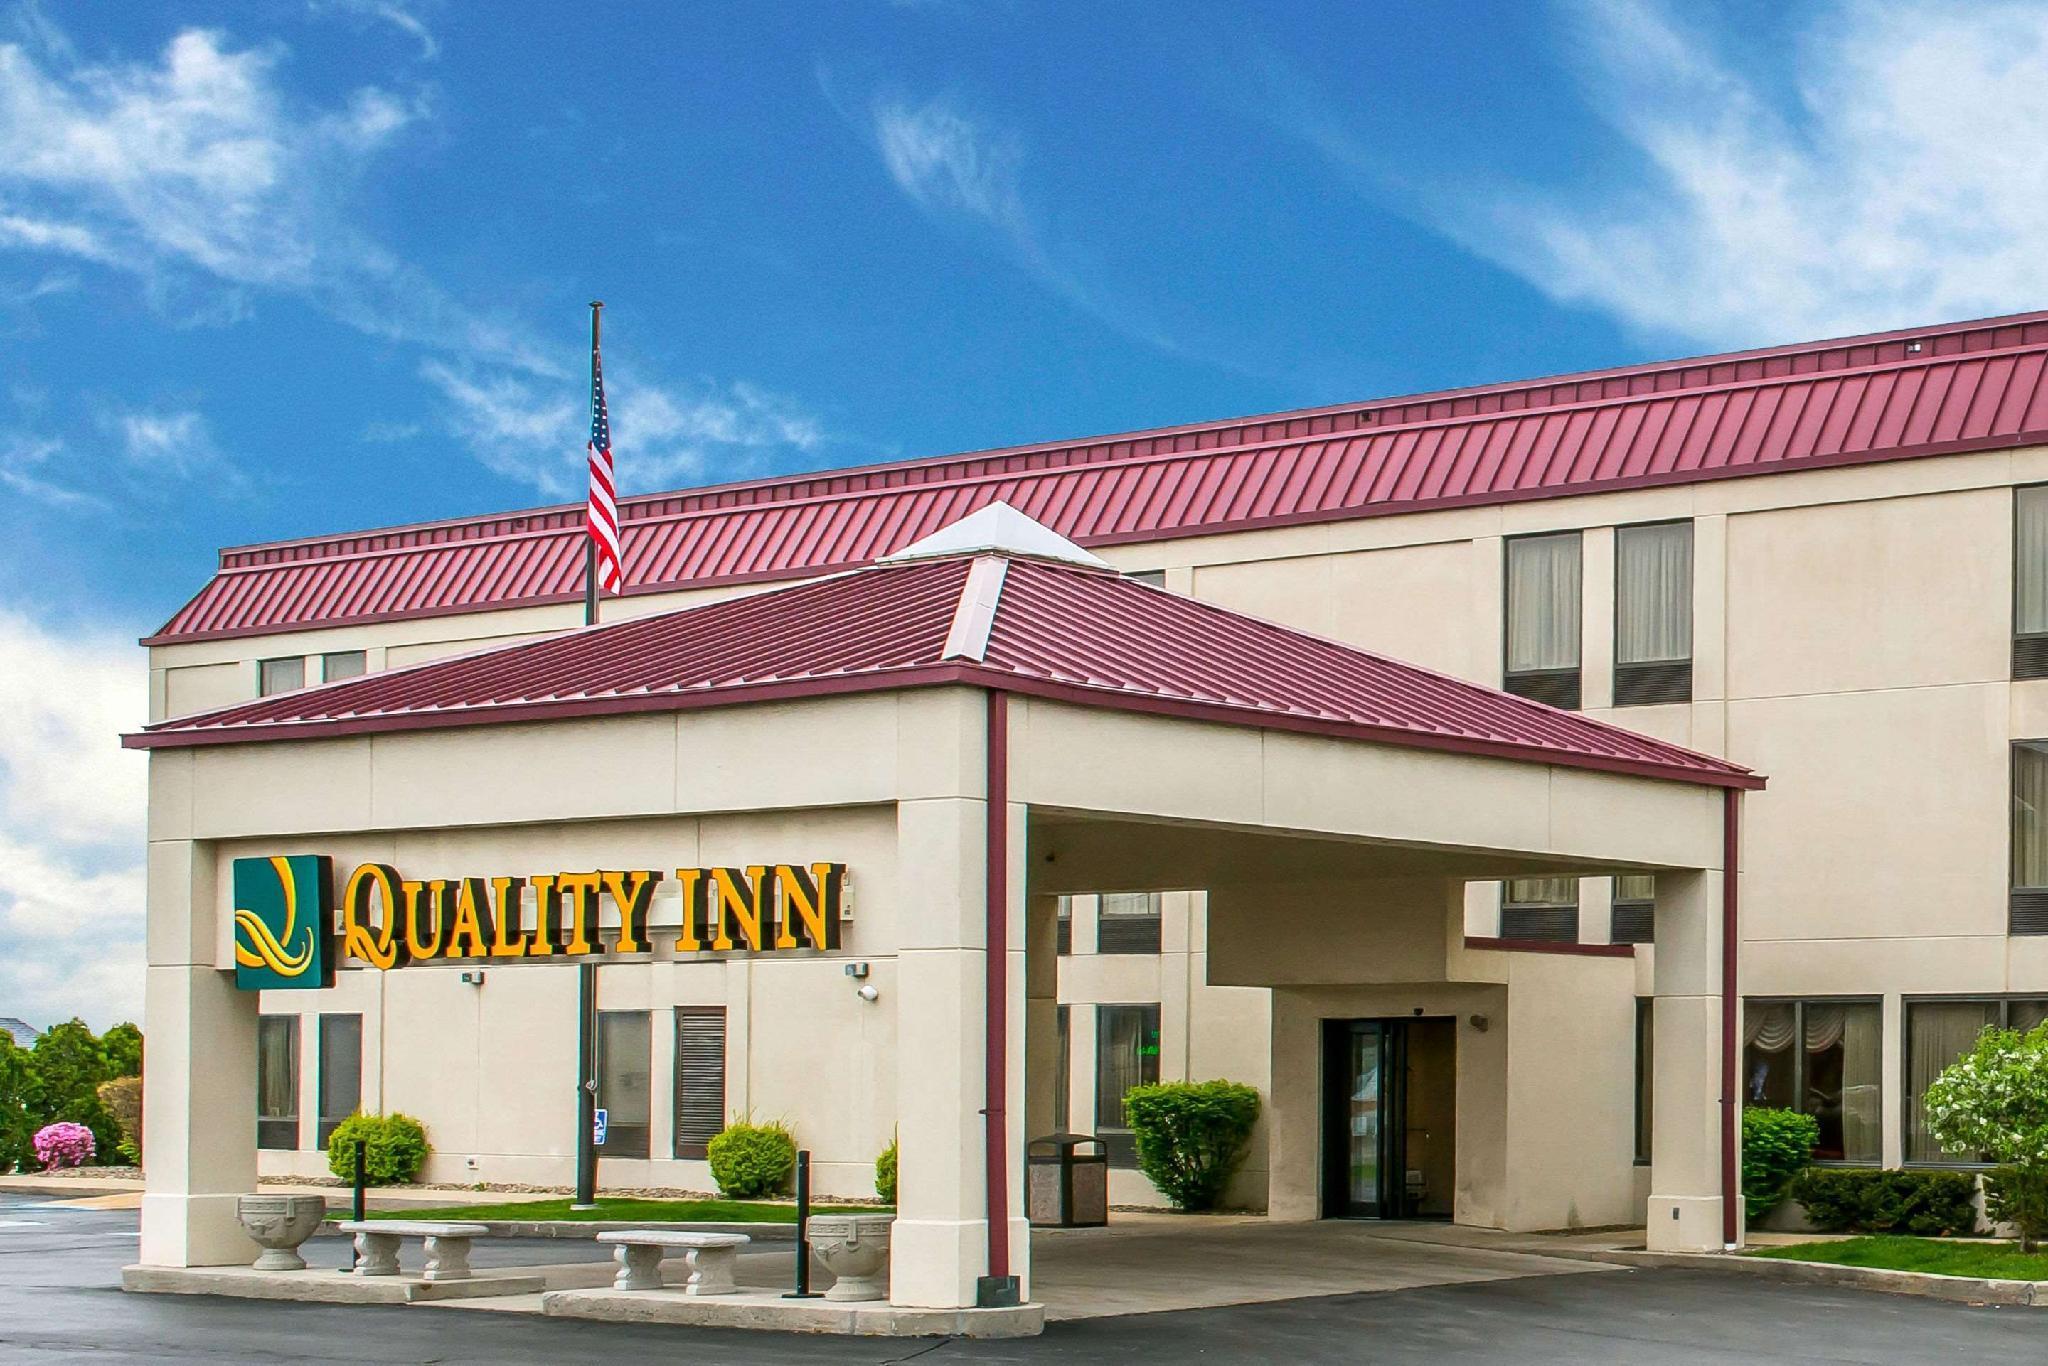 Quality Inn Ebensburg, Cambria